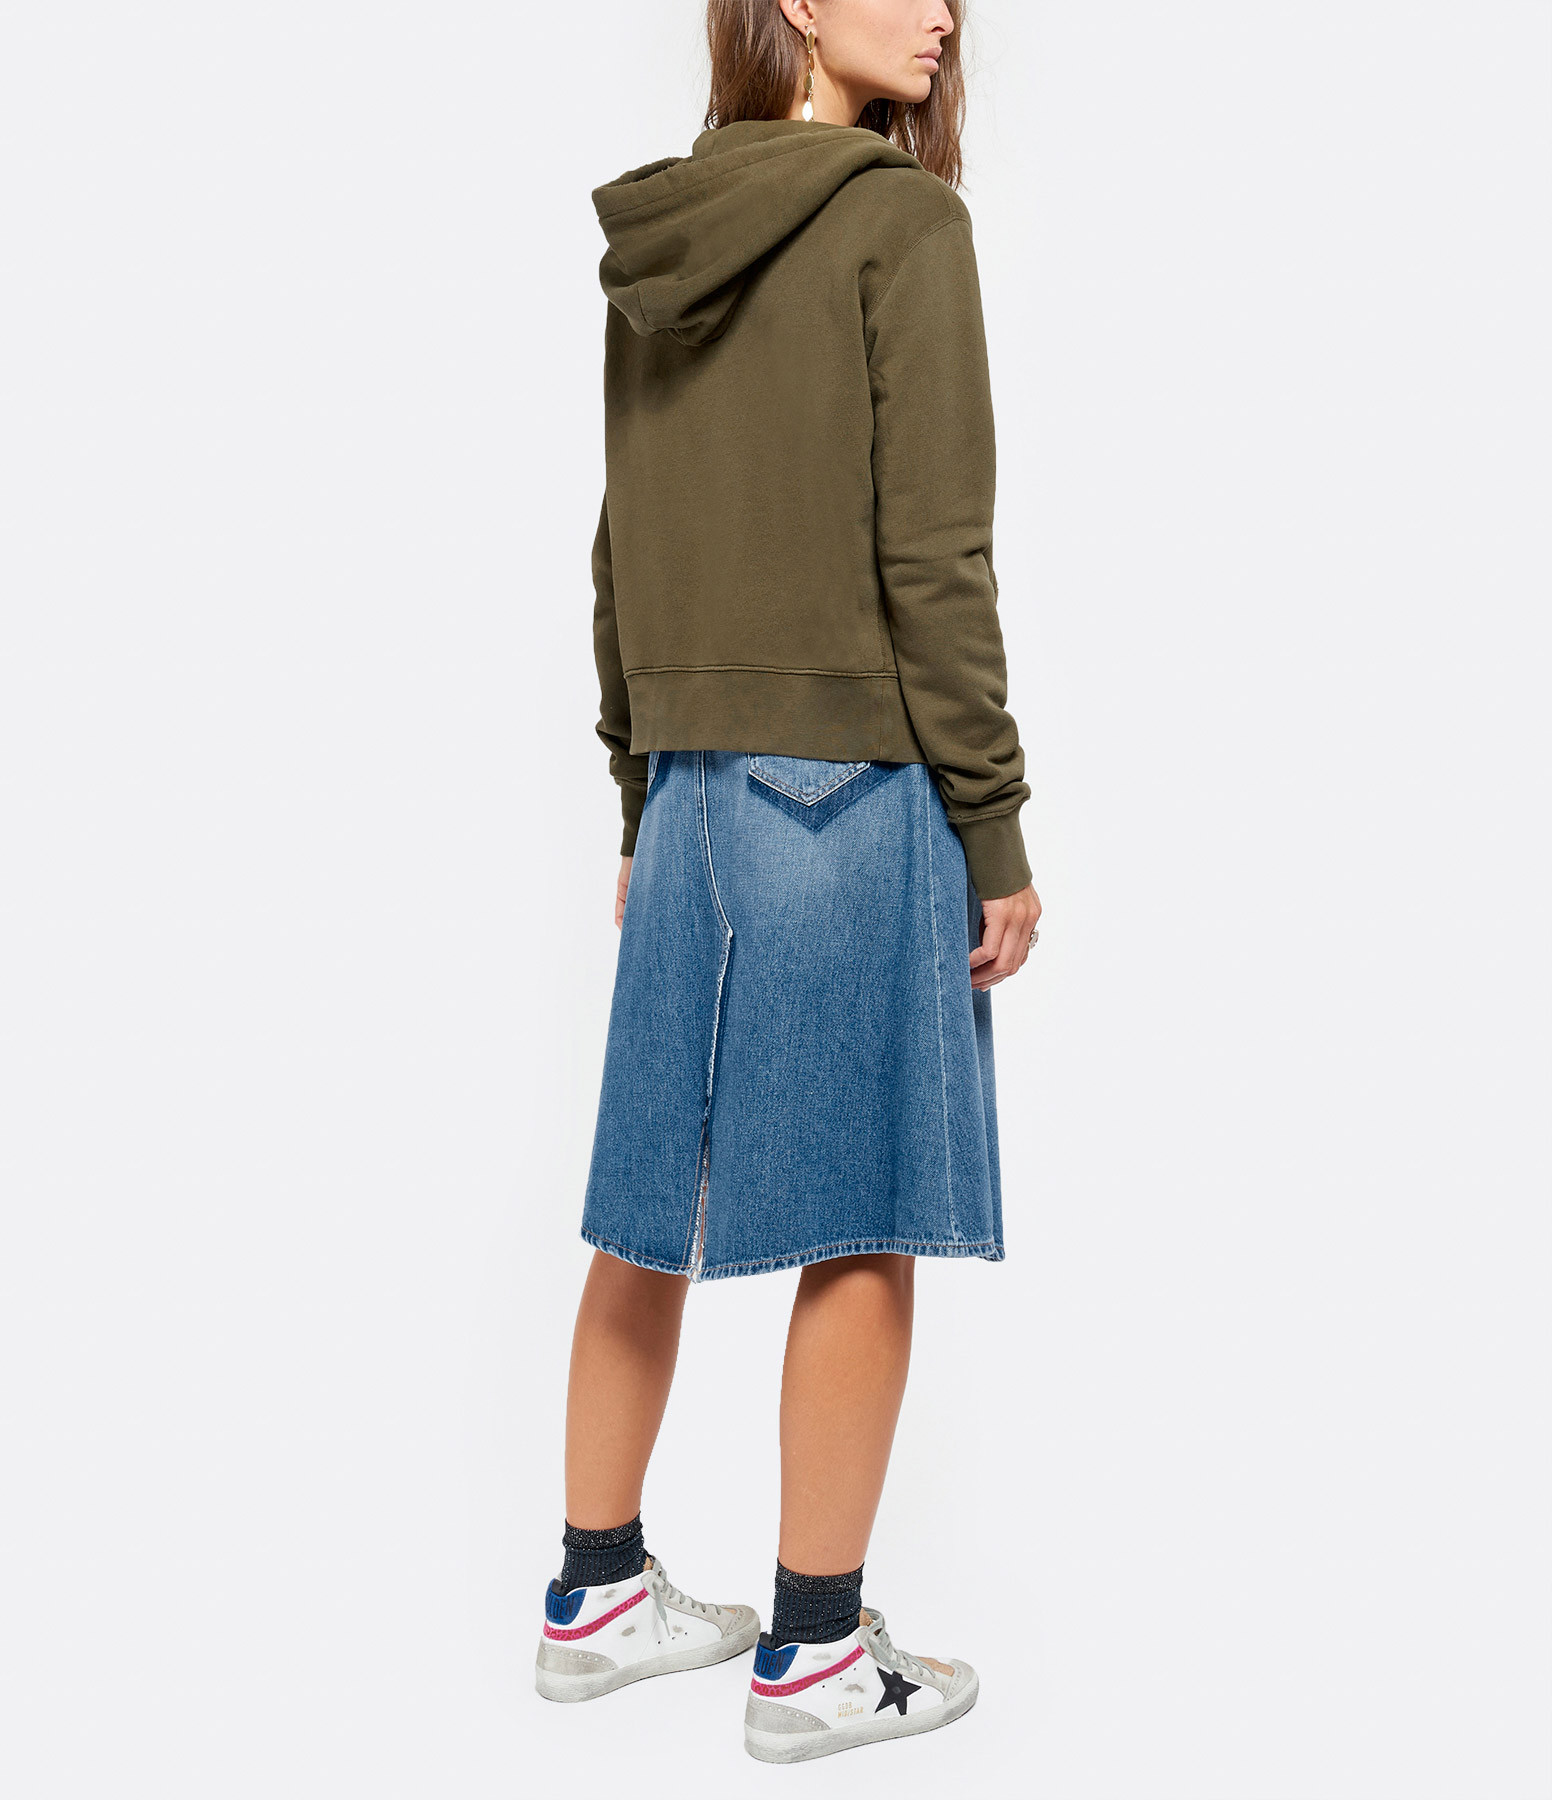 NILI LOTAN - Sweatshirt Zippé Callie Vert Army